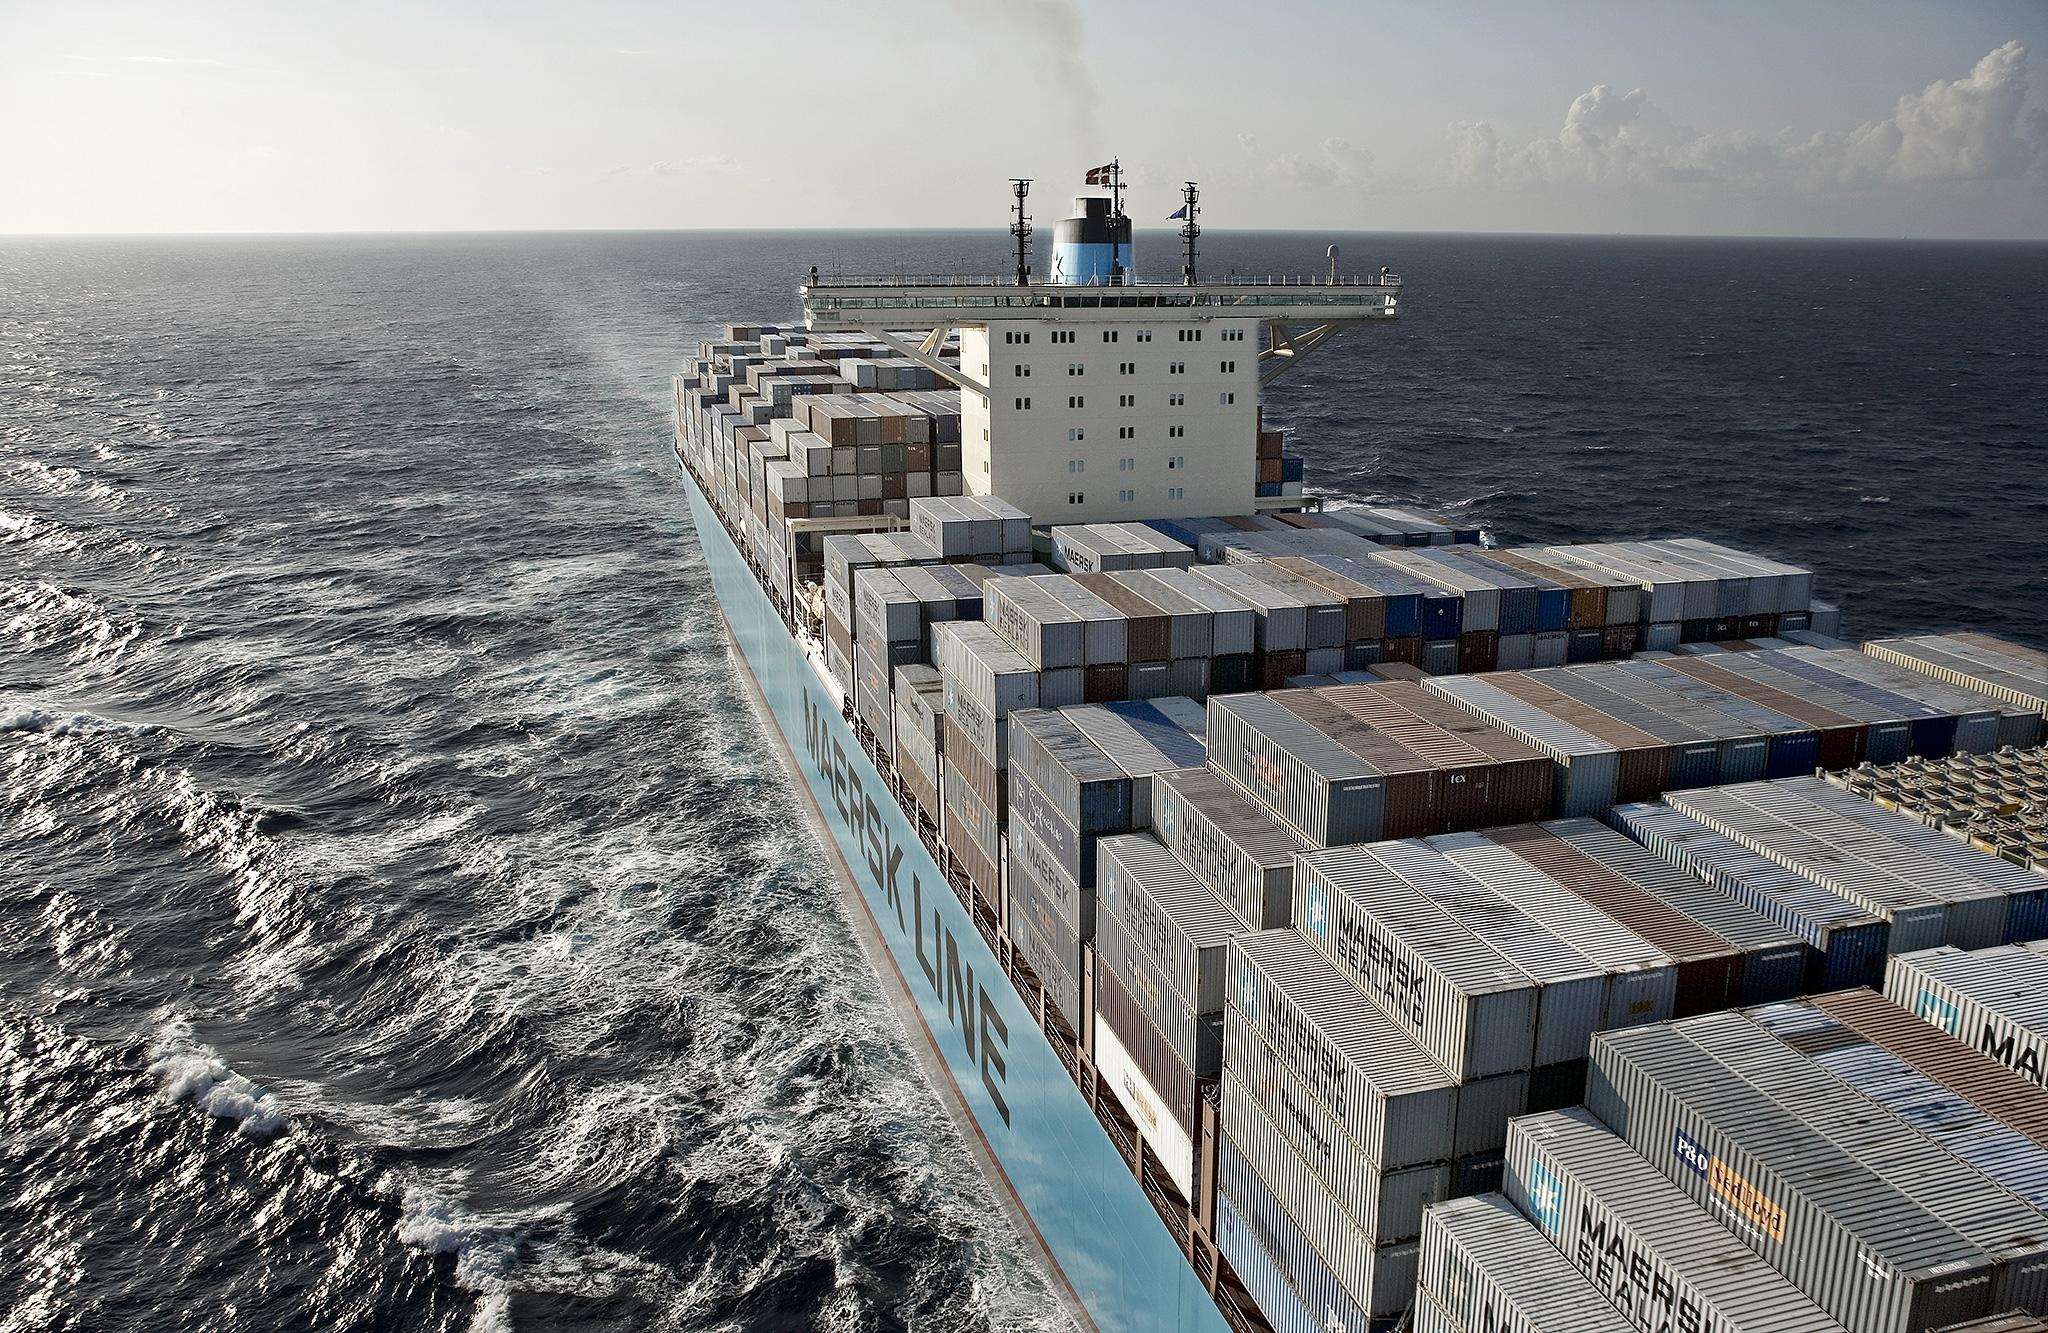 Maersk Lines